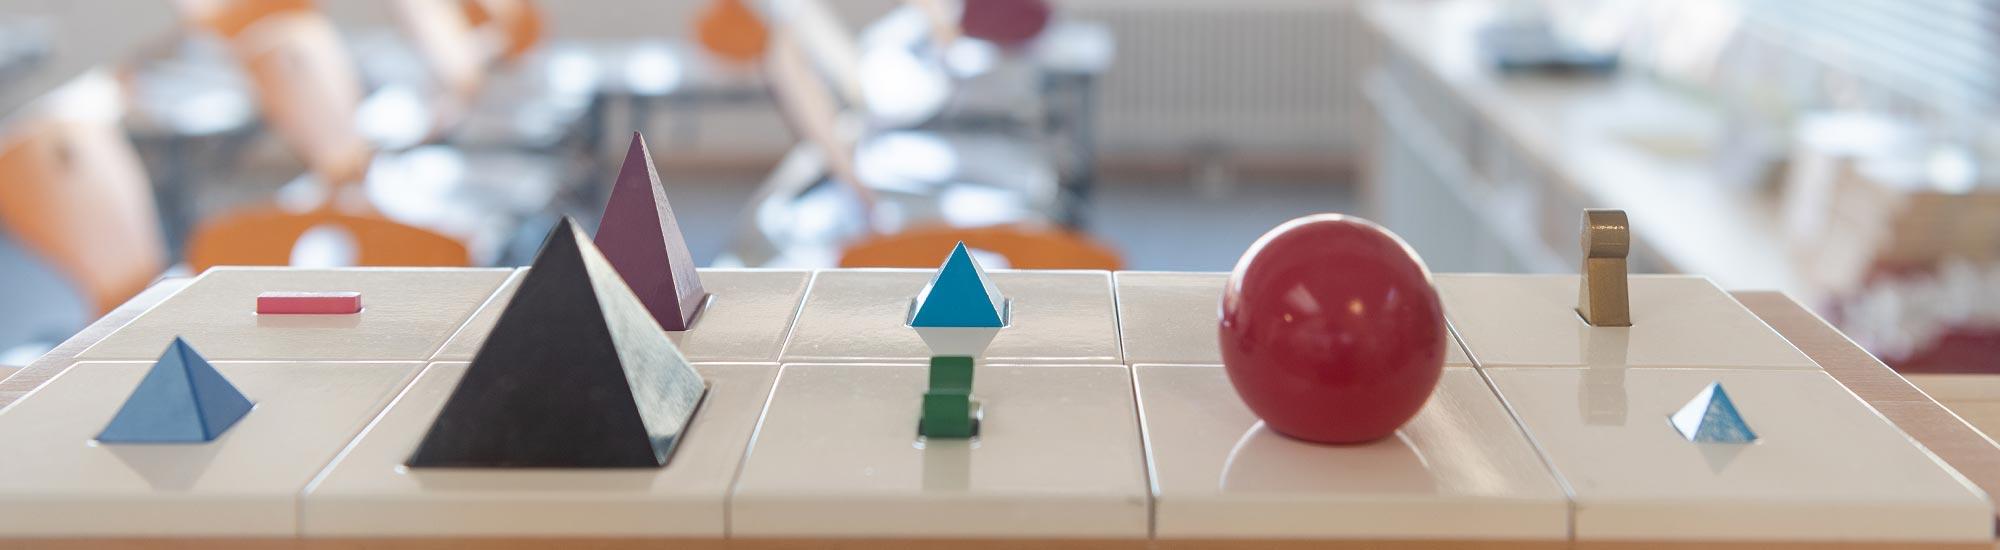 Montessori-Werkstatt